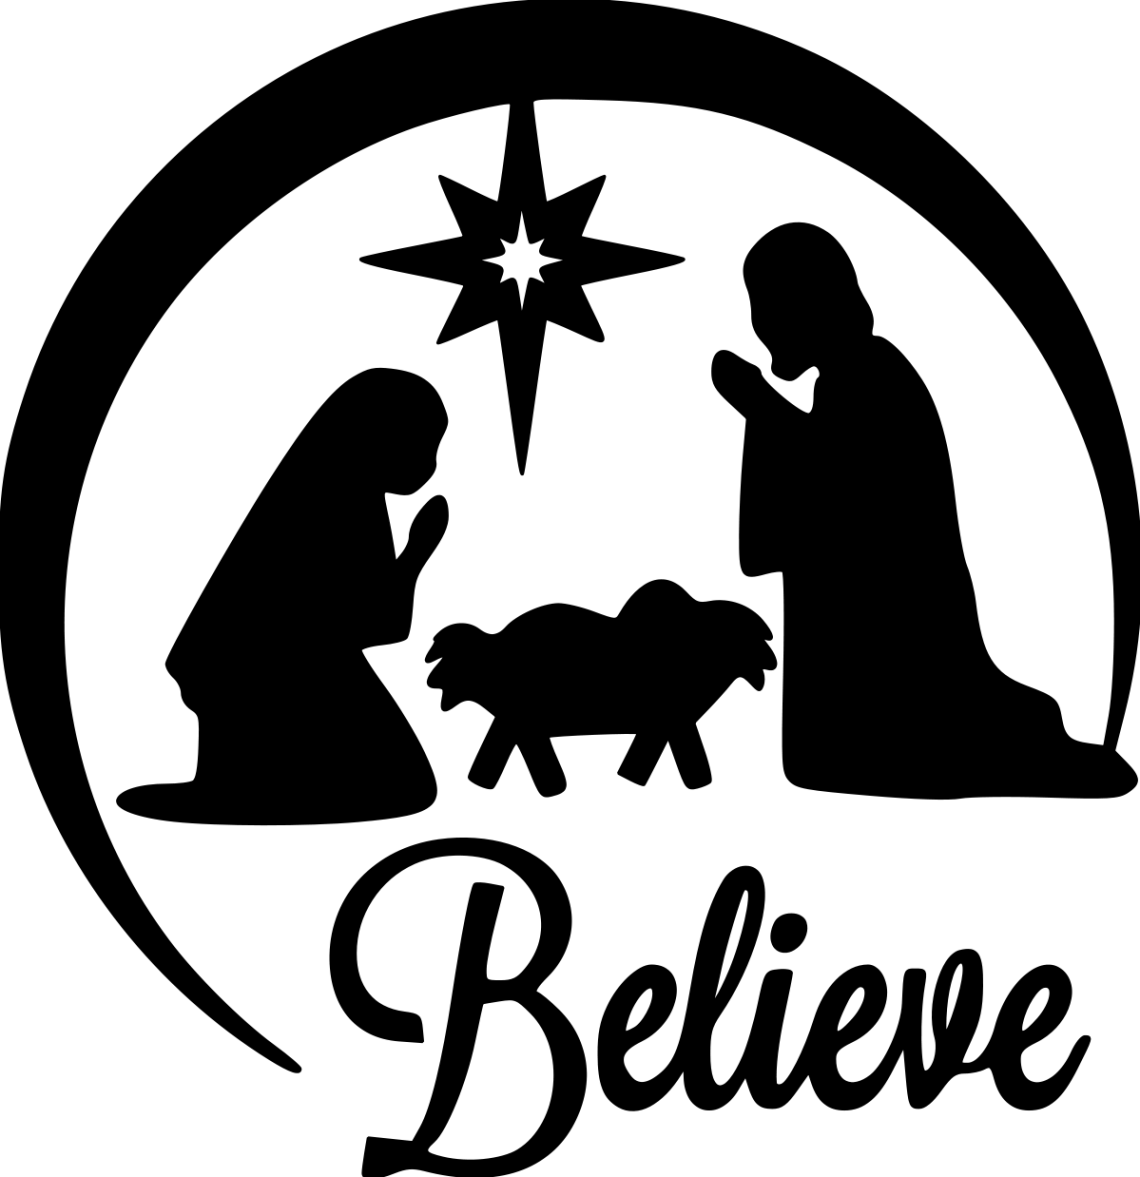 Download Nativity clipart svg free, Nativity svg free Transparent ...